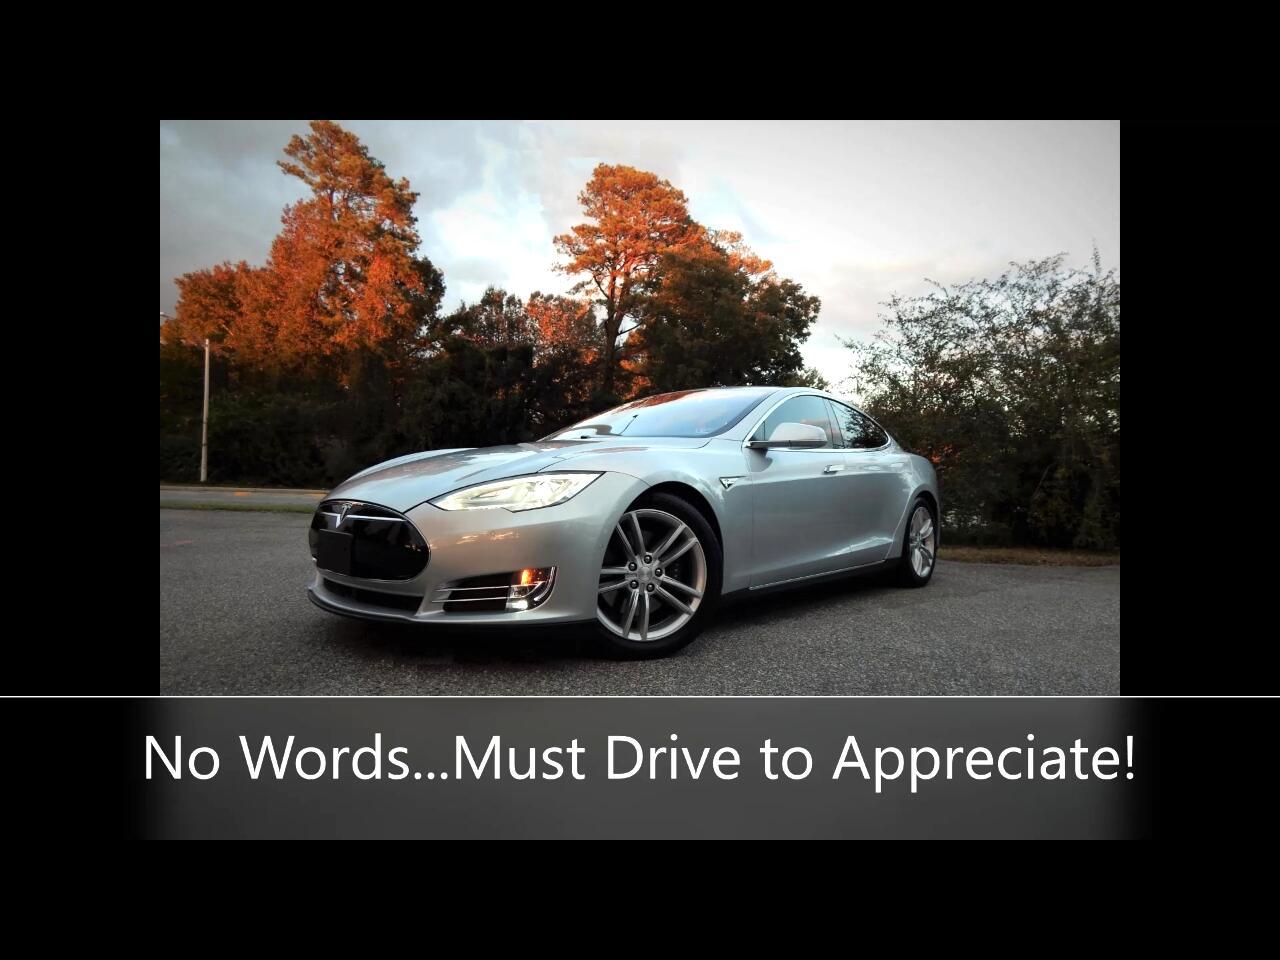 Tesla Model S 4dr Sdn AWD 90D 2016